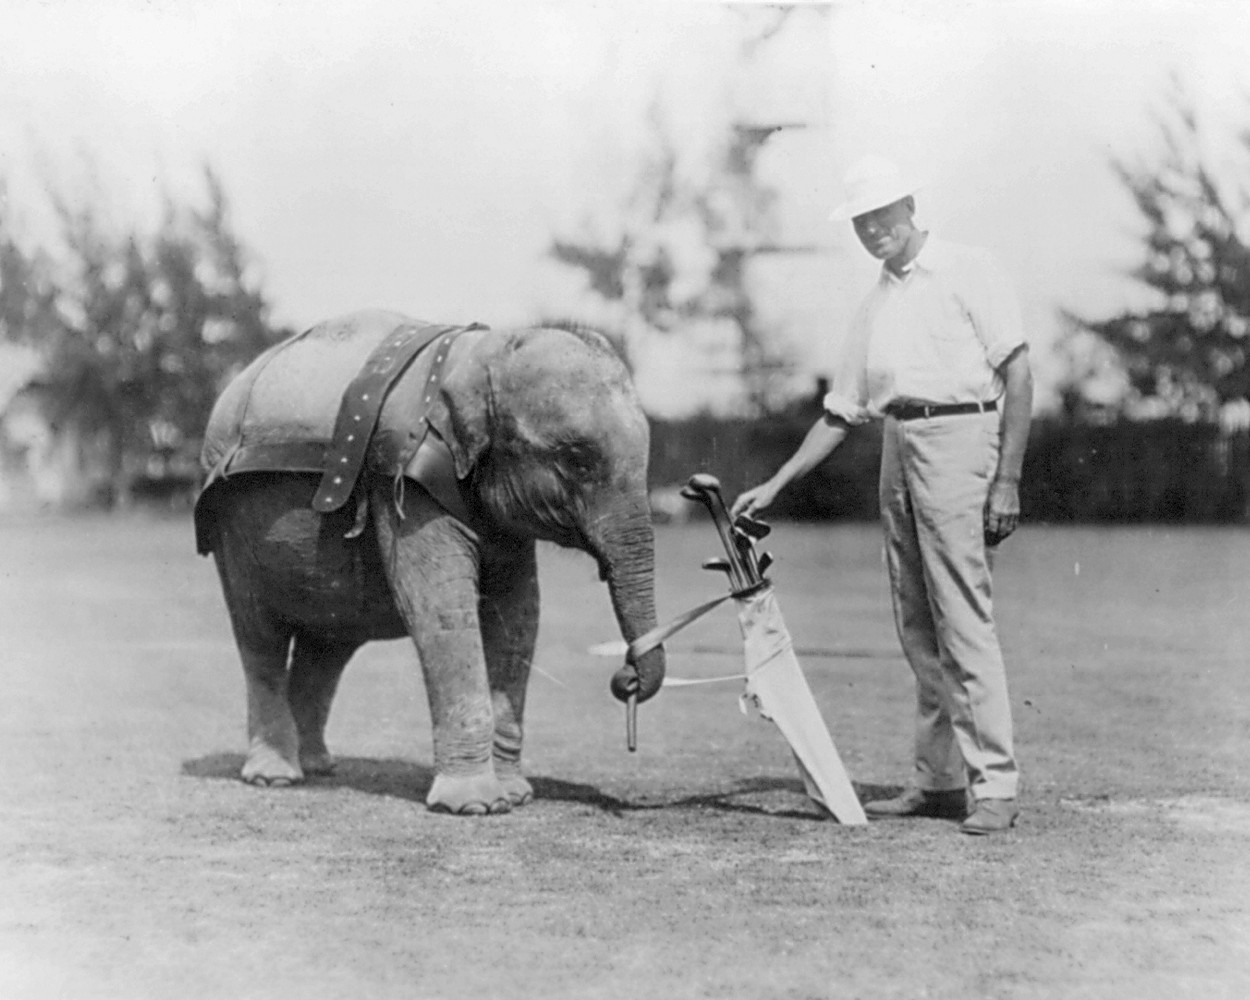 Elephant_caddy